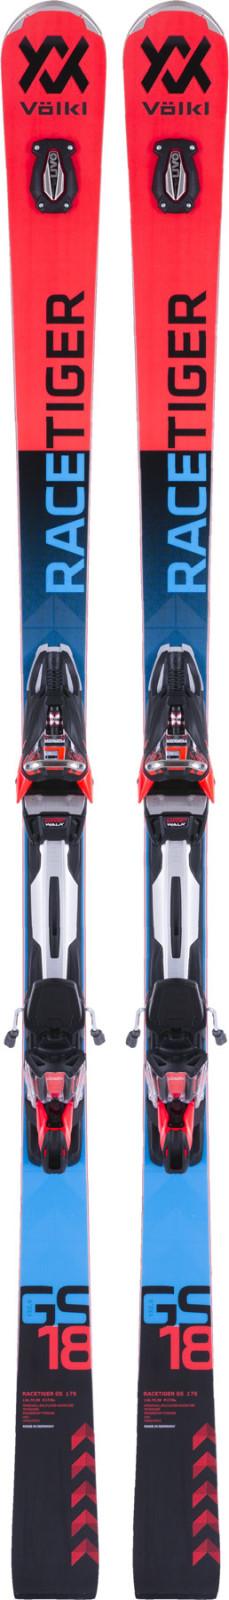 Völkl Racetiger GS + rMotion2 16 GW Race